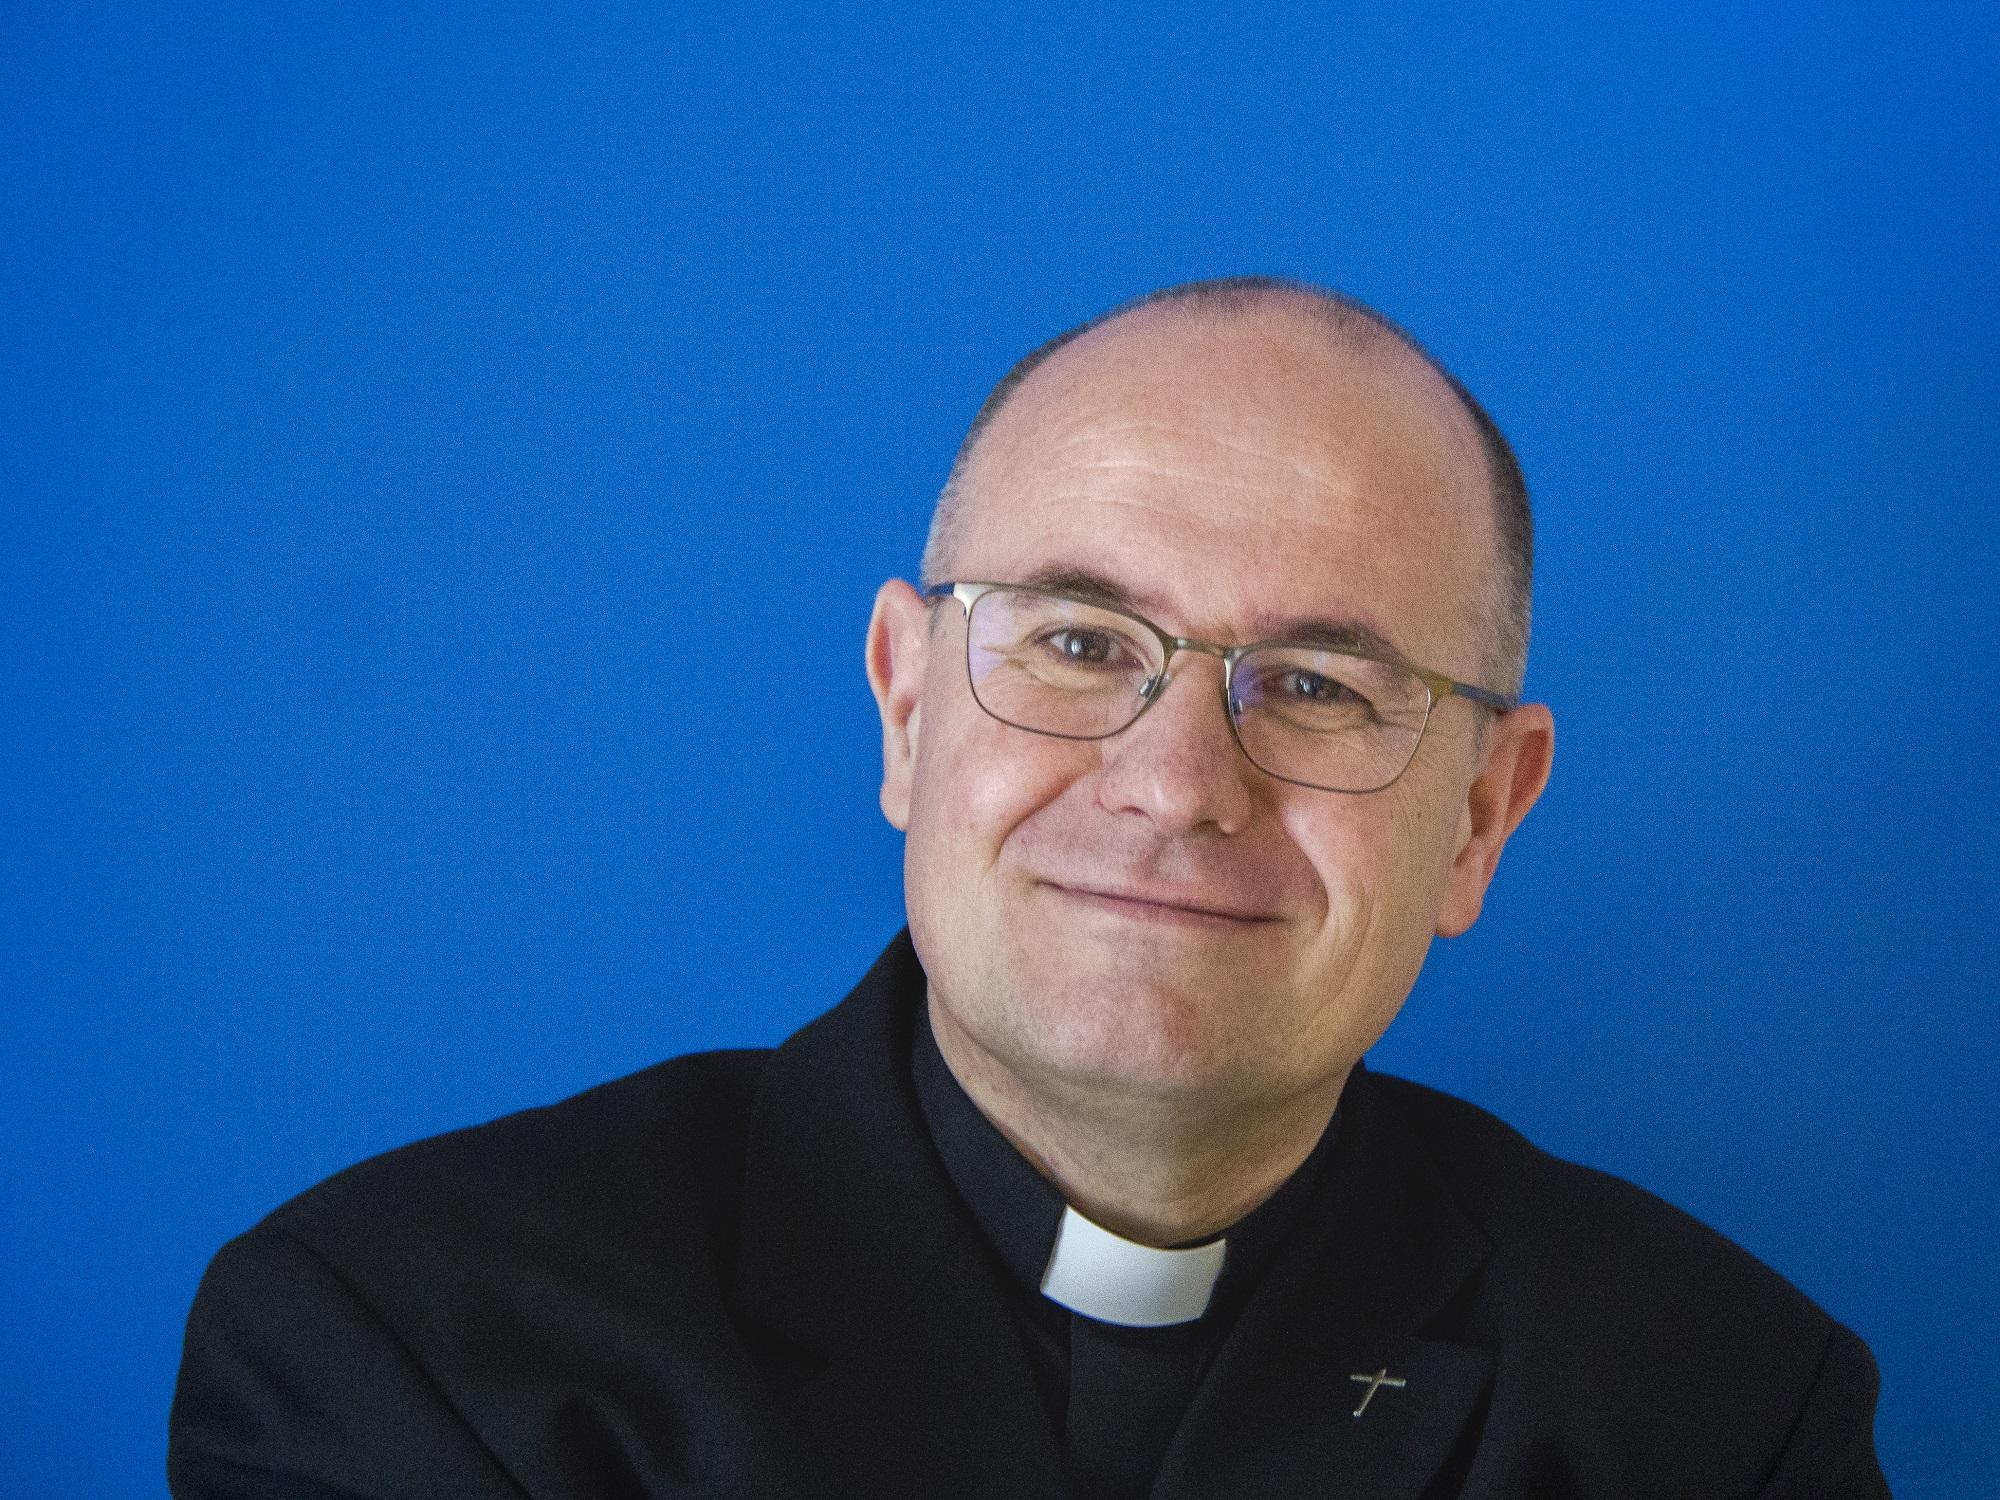 L'abbé Bondu élu administrateur diocésain